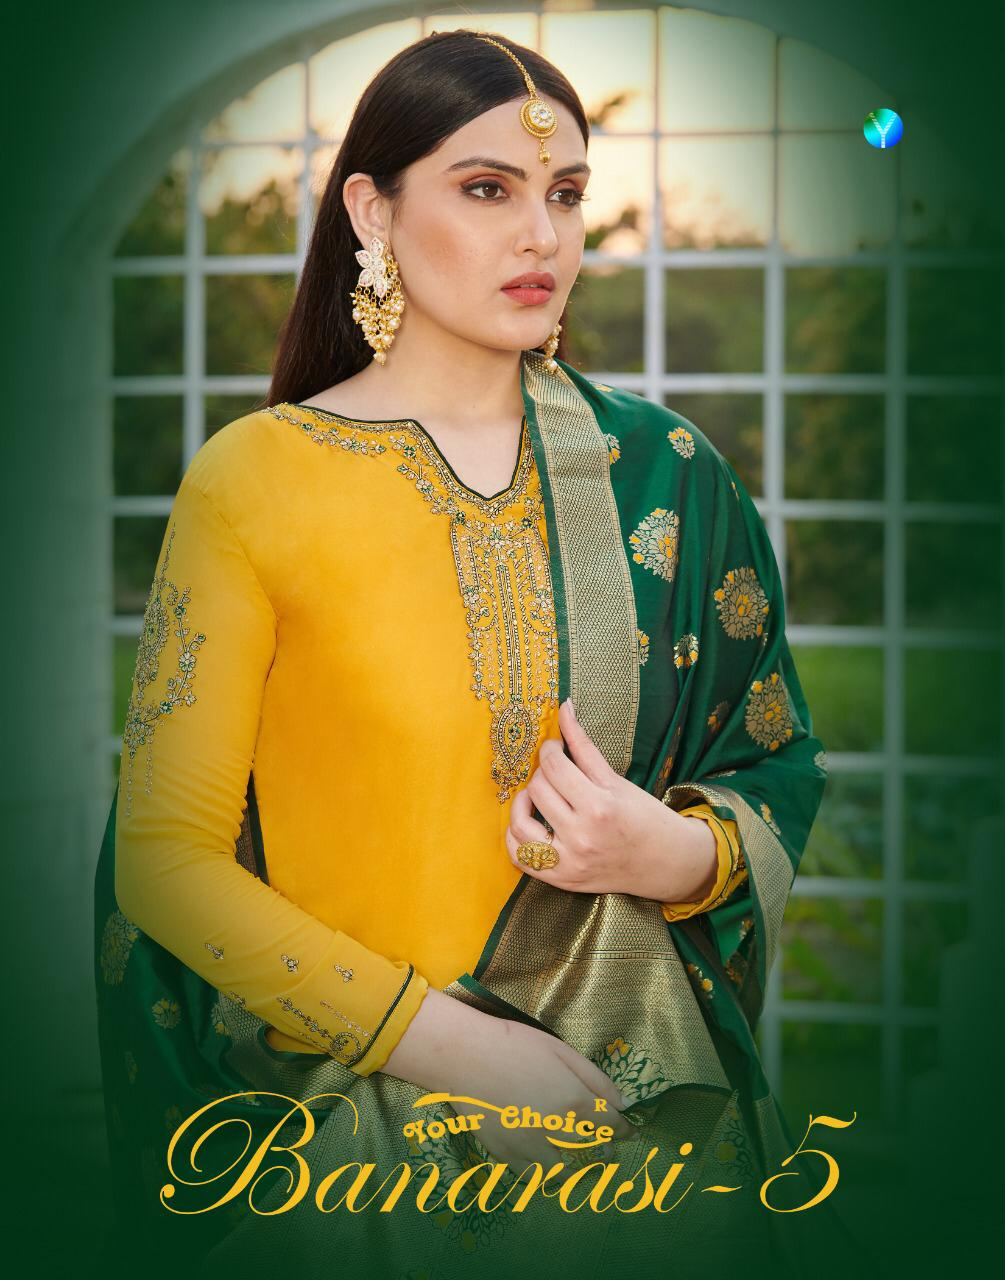 Your Choice Present New Banarasi Vol 5 Designer Georgette Salwar Suit Catalog Collection